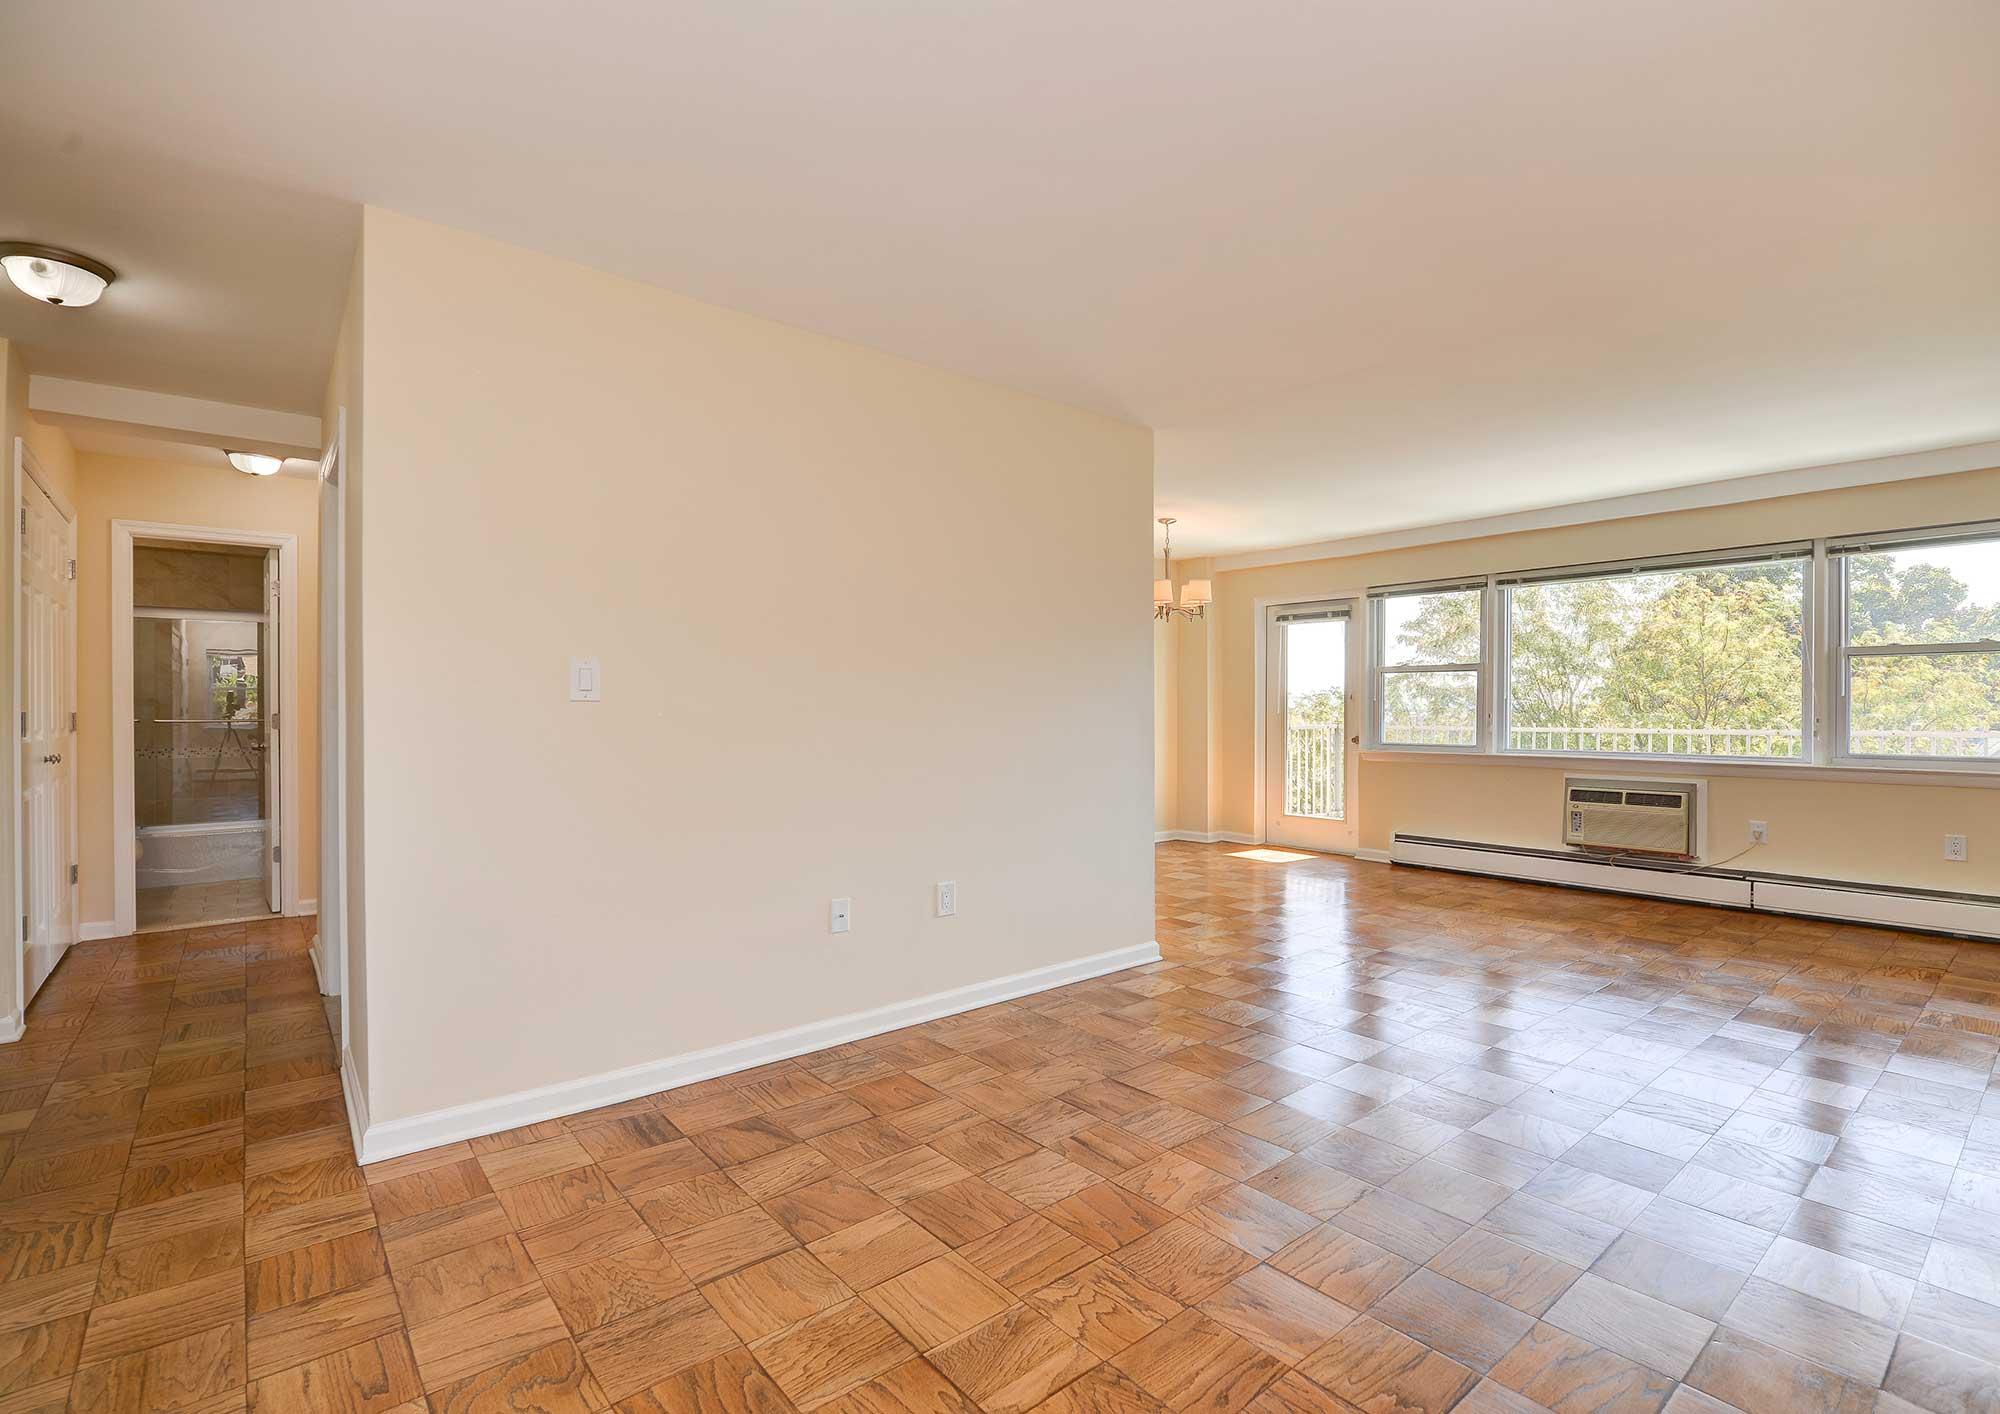 One bedroom floorplan 3